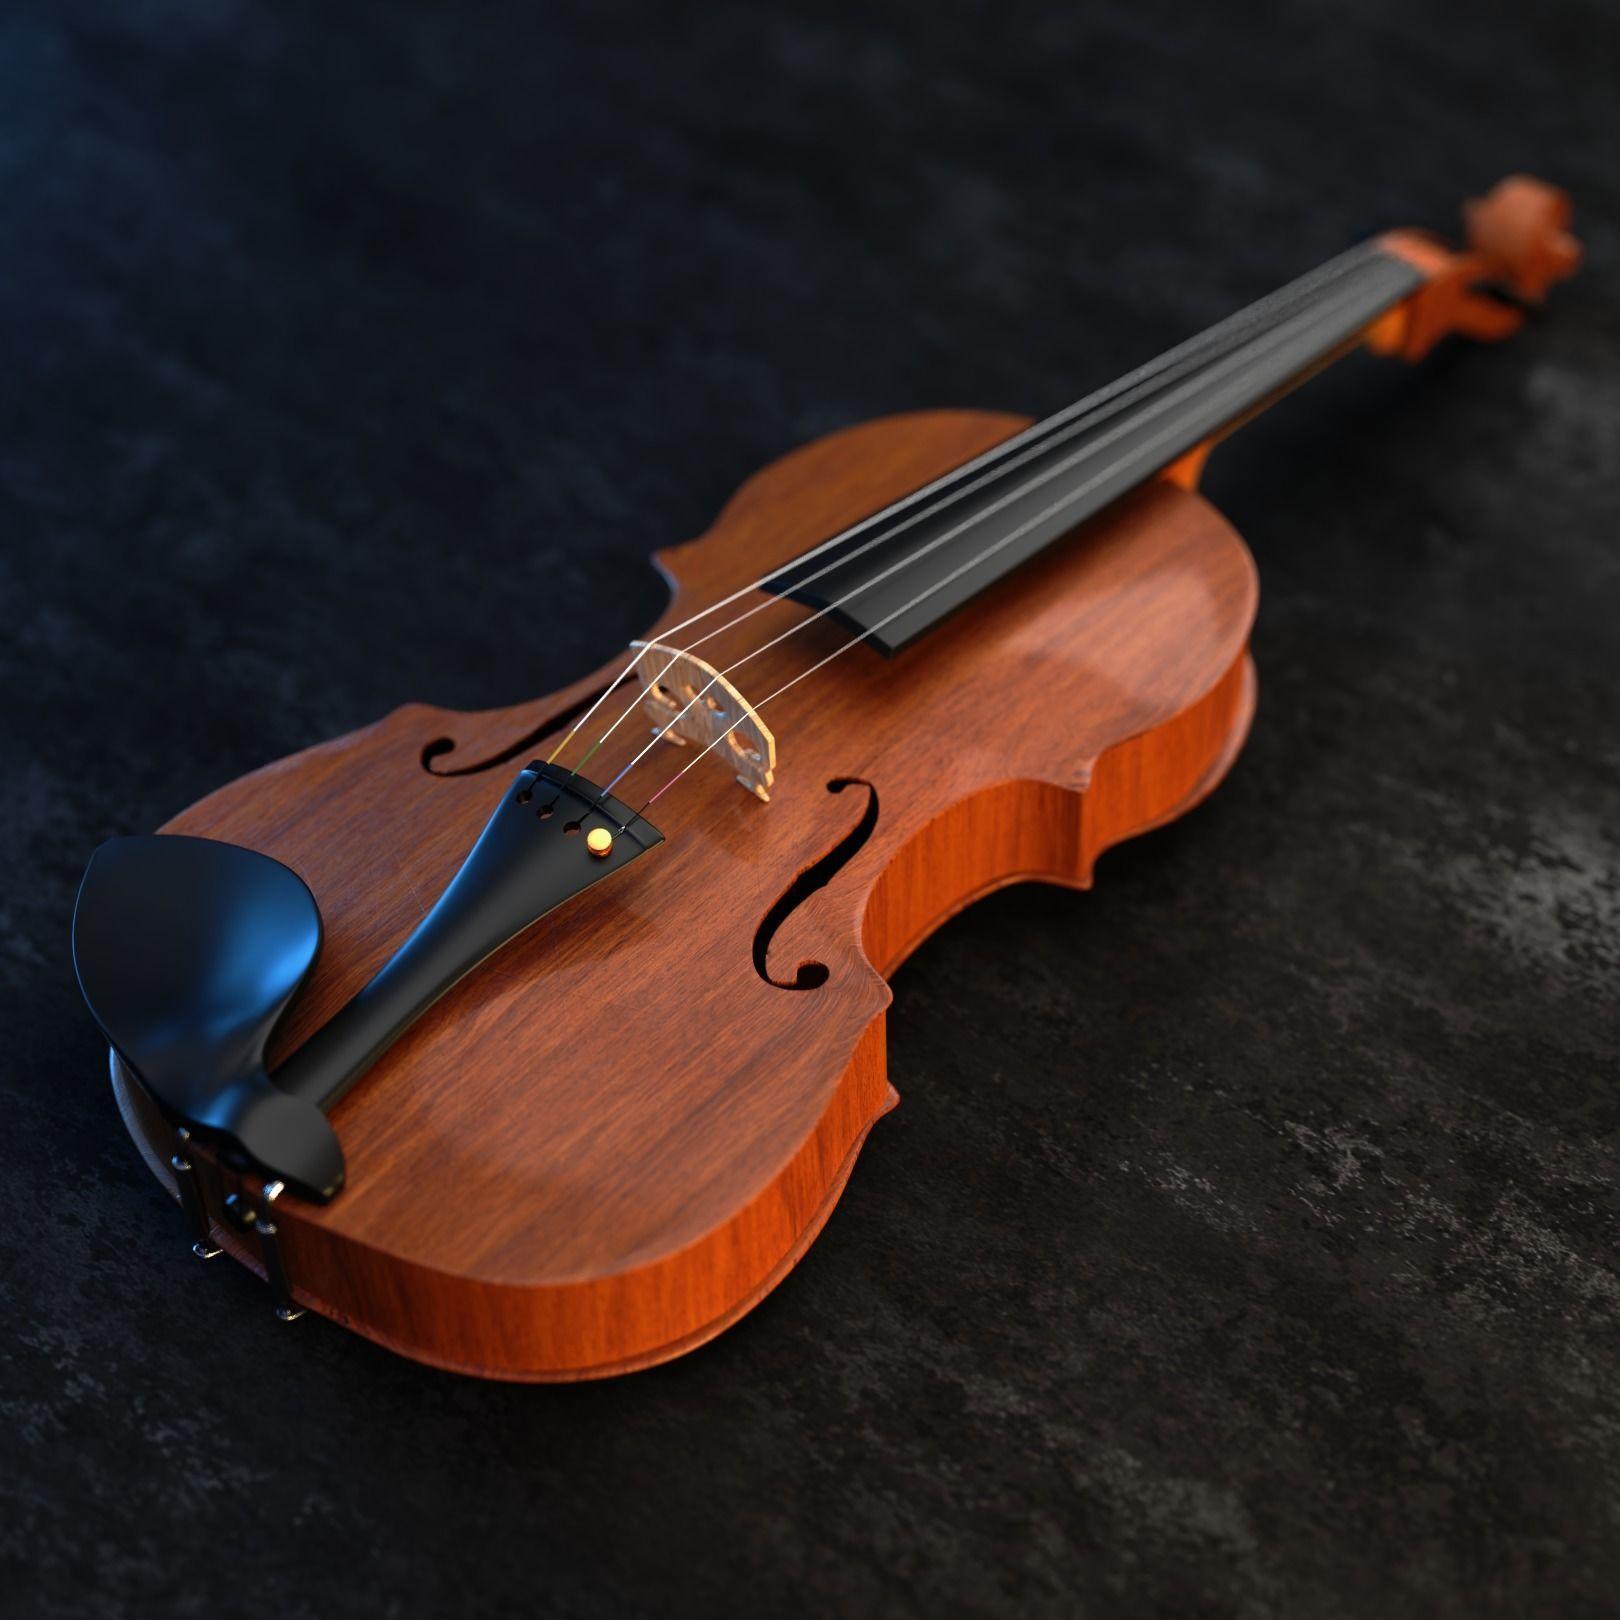 realistic-violin-3d-model-blend.jpg Télécharger fichier STL gratuit ealistic violin 3D model • Design à imprimer en 3D, Anxhelo24j